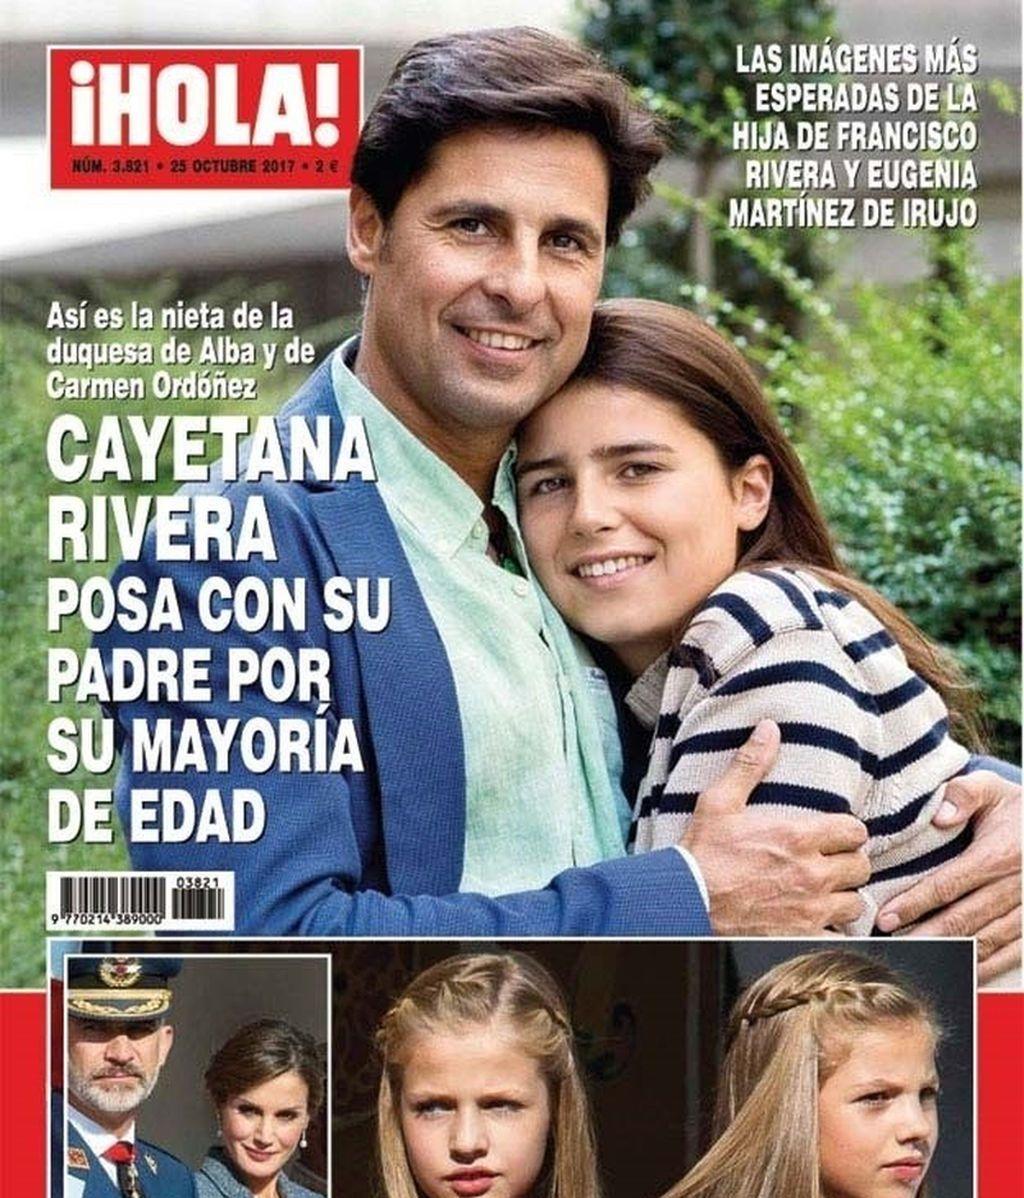 Cayetana-Rivera